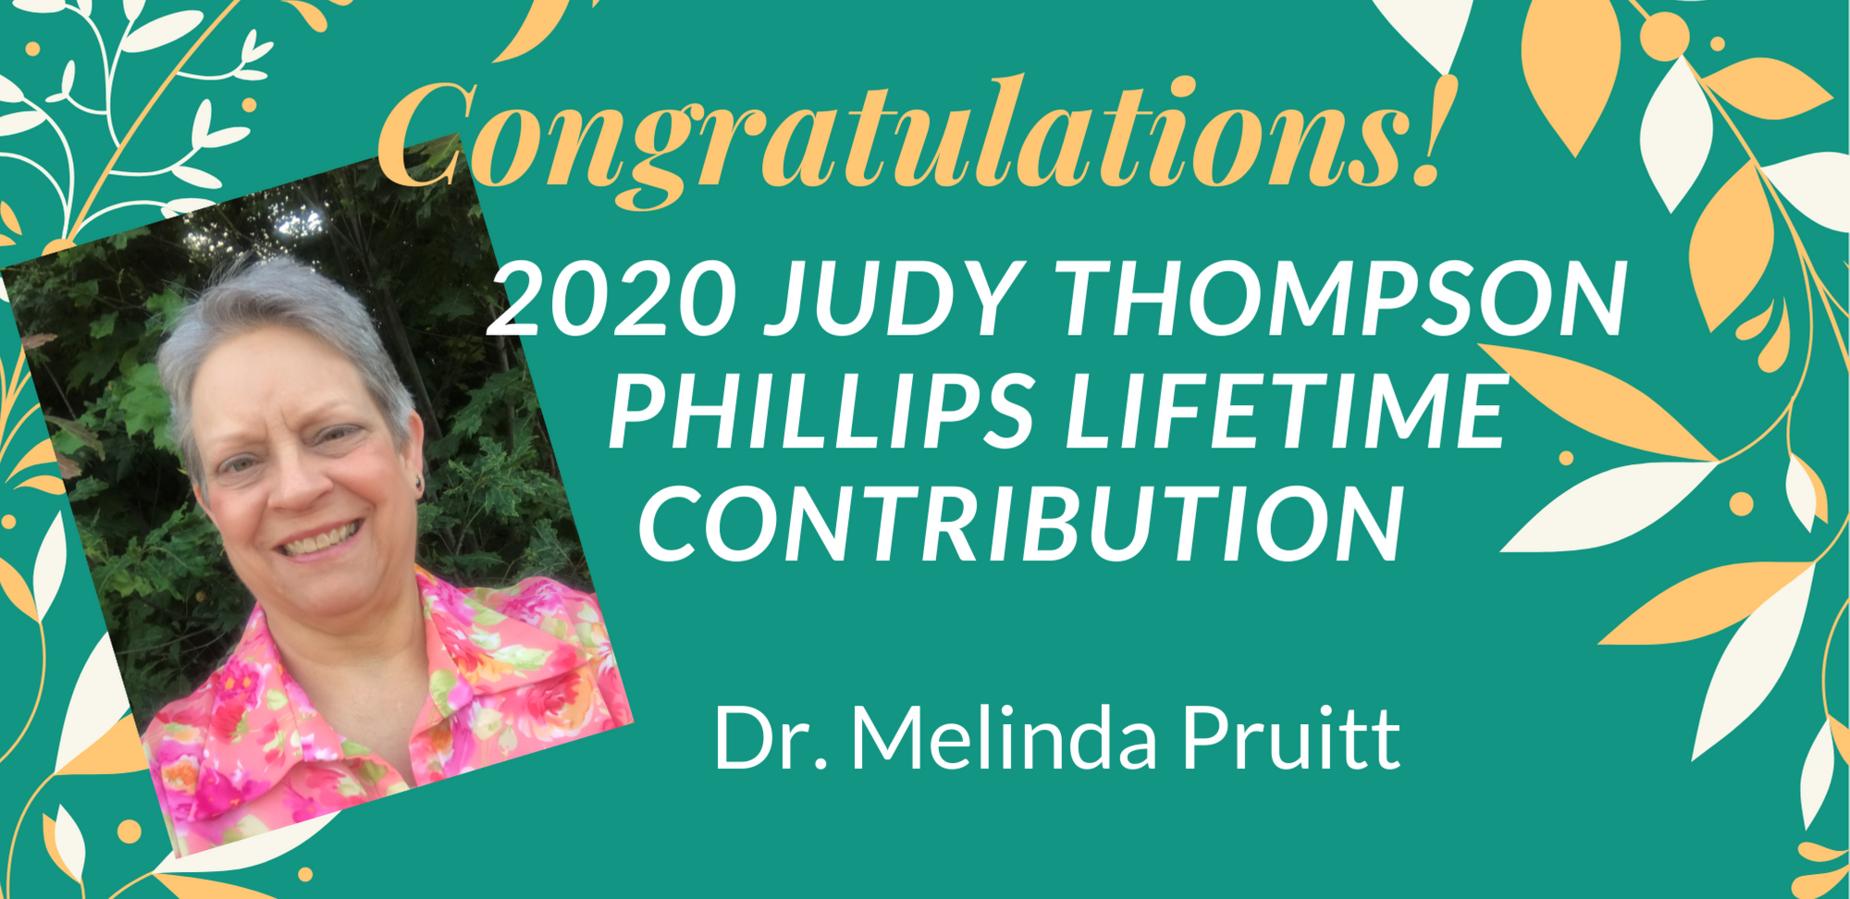 Dr. Melinda Pruitt, 2020 Judy Thompson Phillips Lifetime Contribution Award